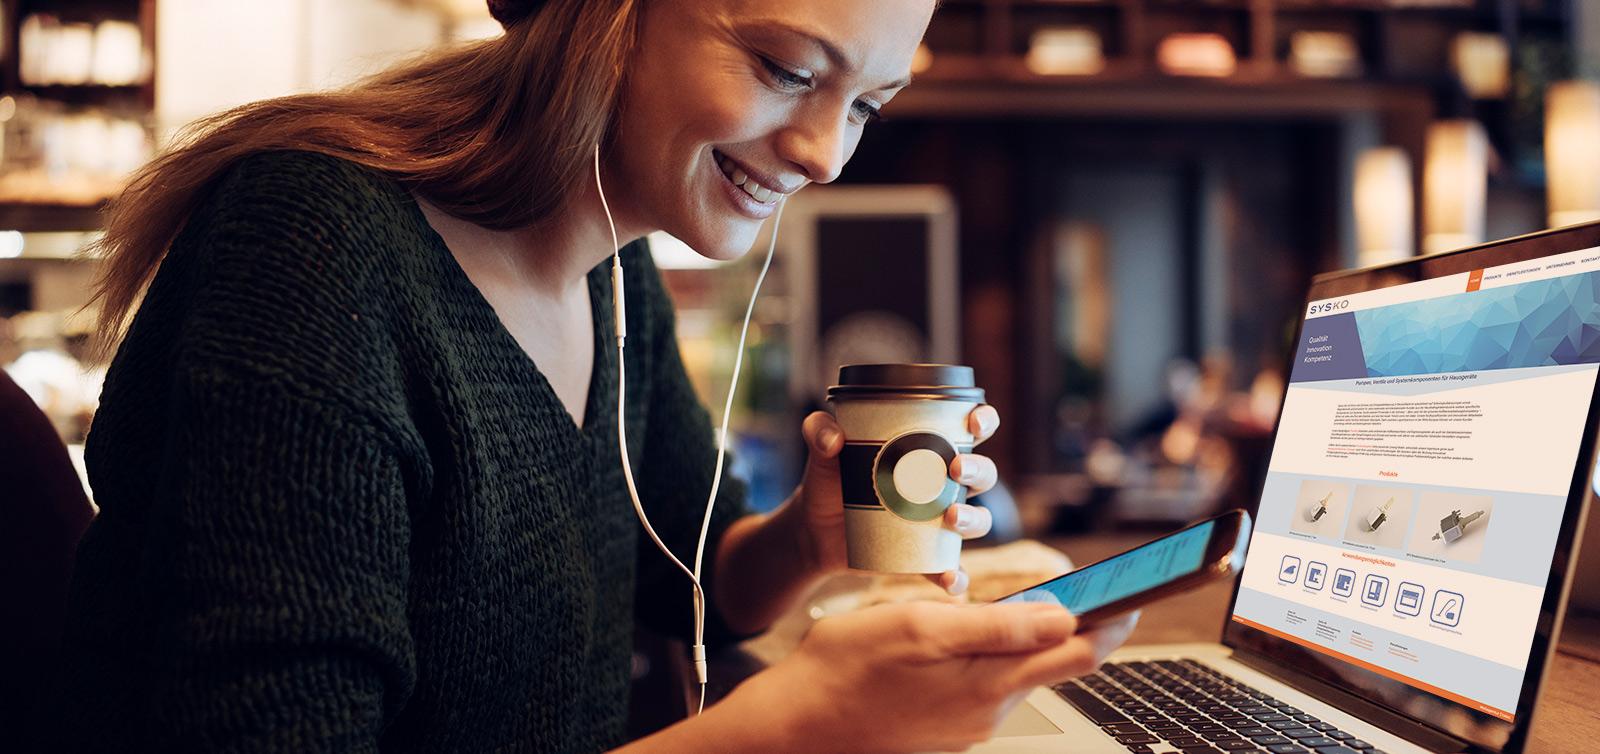 content-referenzen-details-sysko-laptop-kaffee-desktop